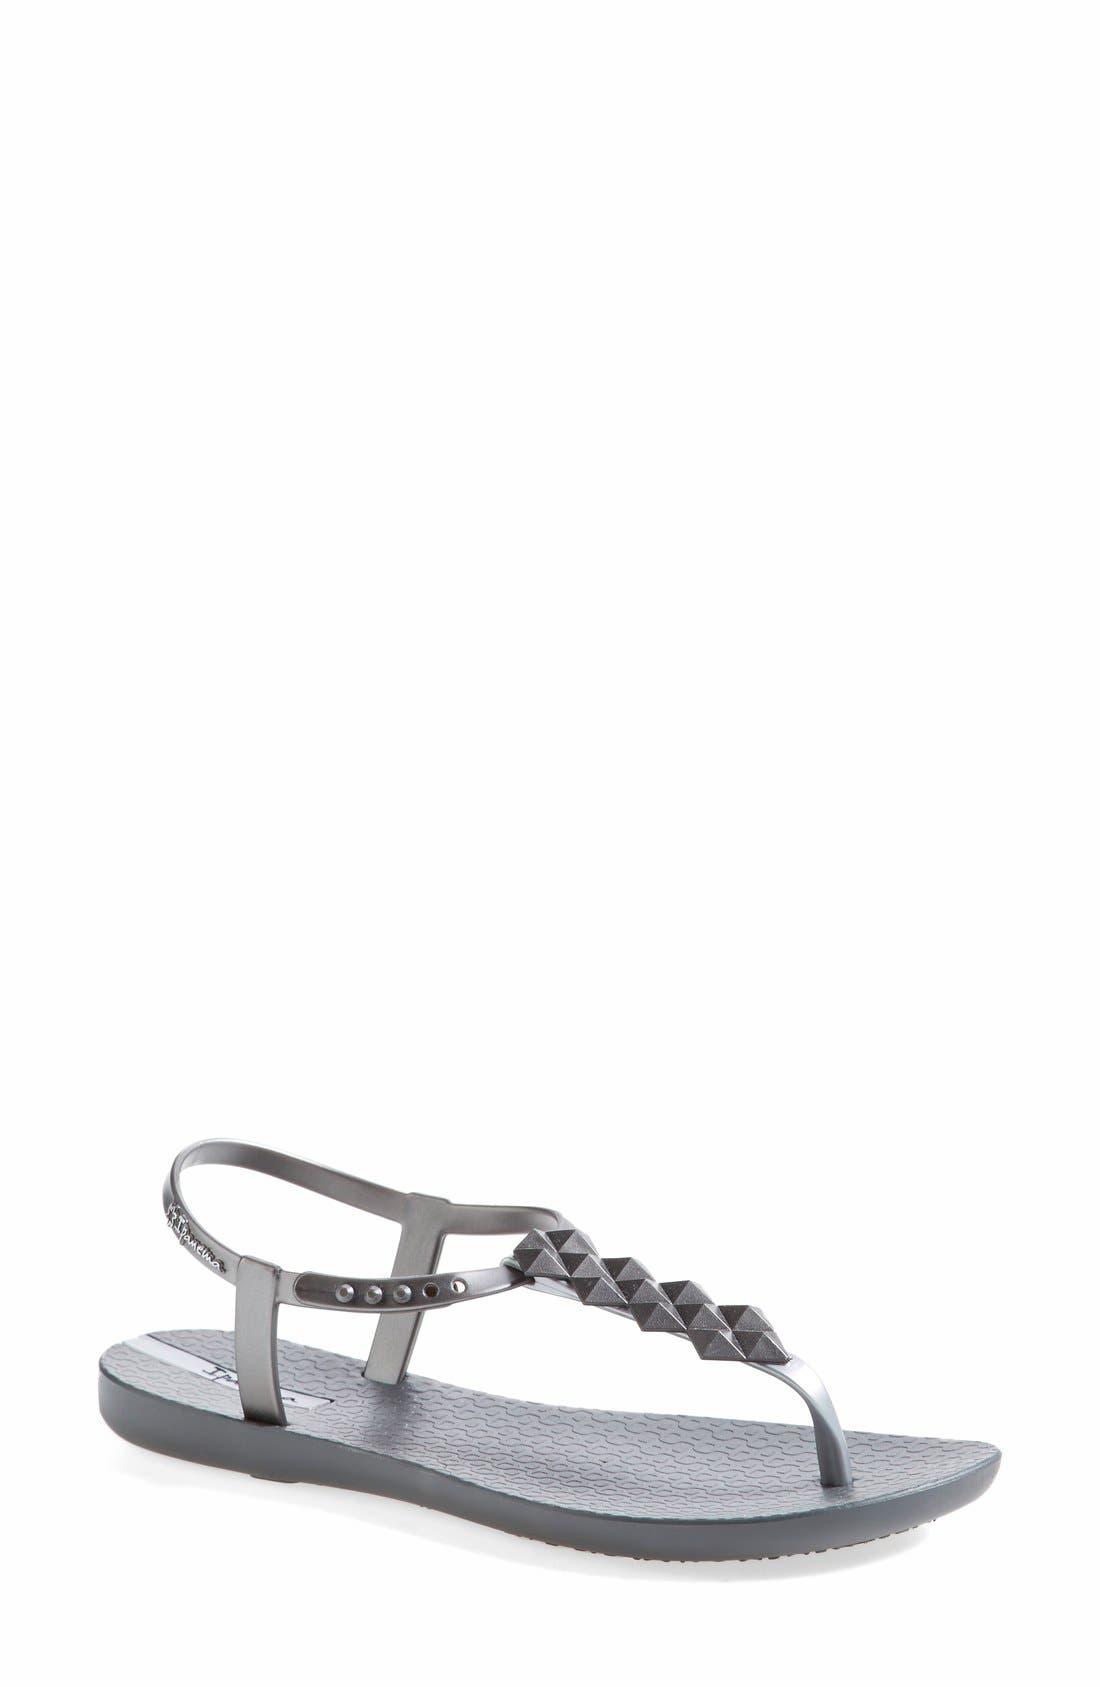 Main Image - Ipanema 'Cleo' Pyramid Stud Ankle Strap Flip Flop